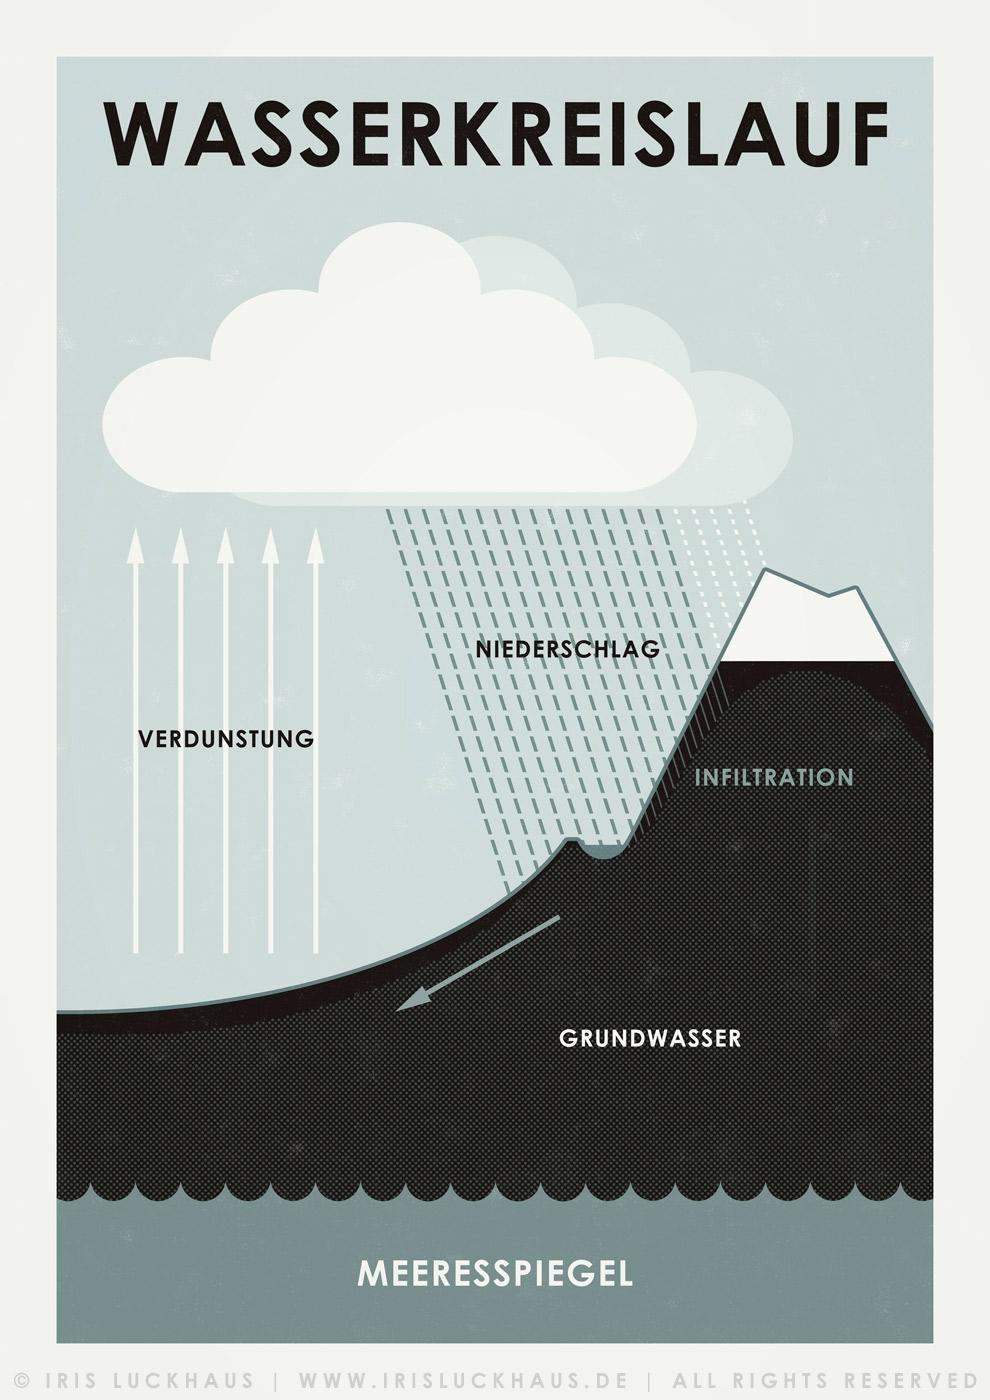 irisluckhaus_infografik_wasserkreislauf_990